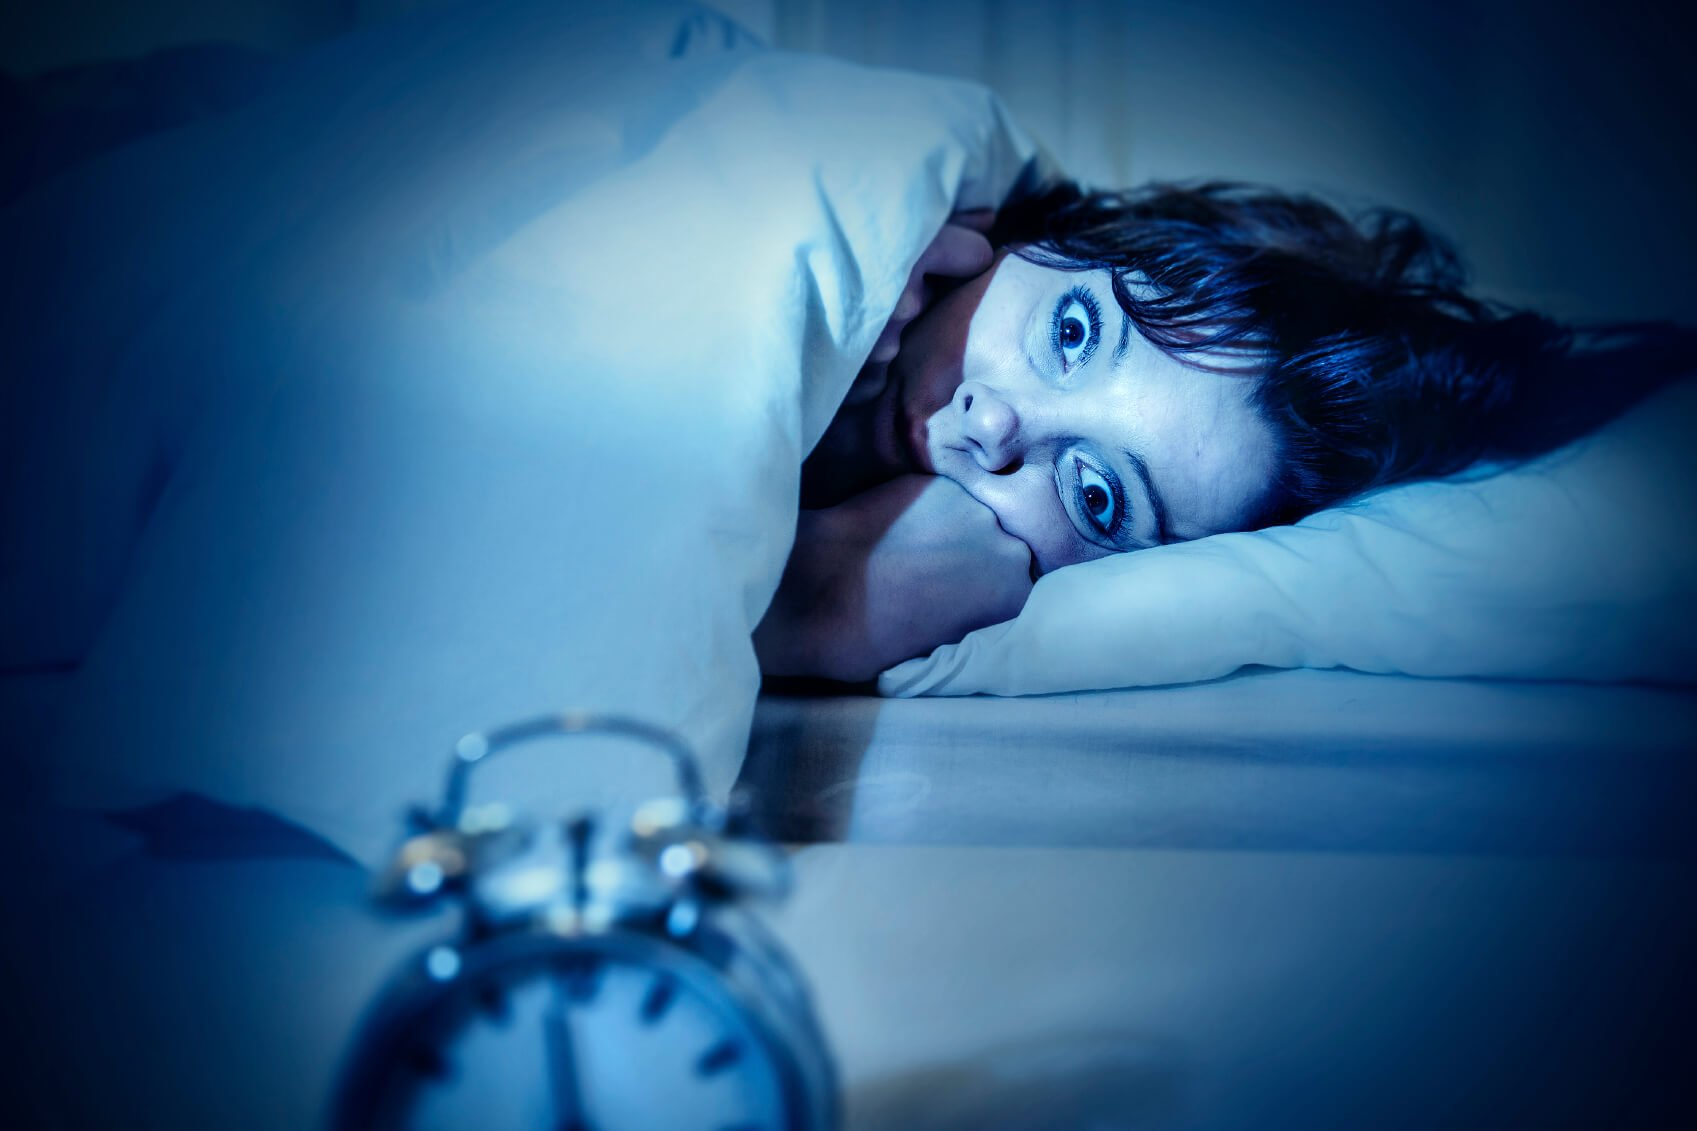 Conheça a Paralisia Do Sono e 4 Técnicas Para Evitar